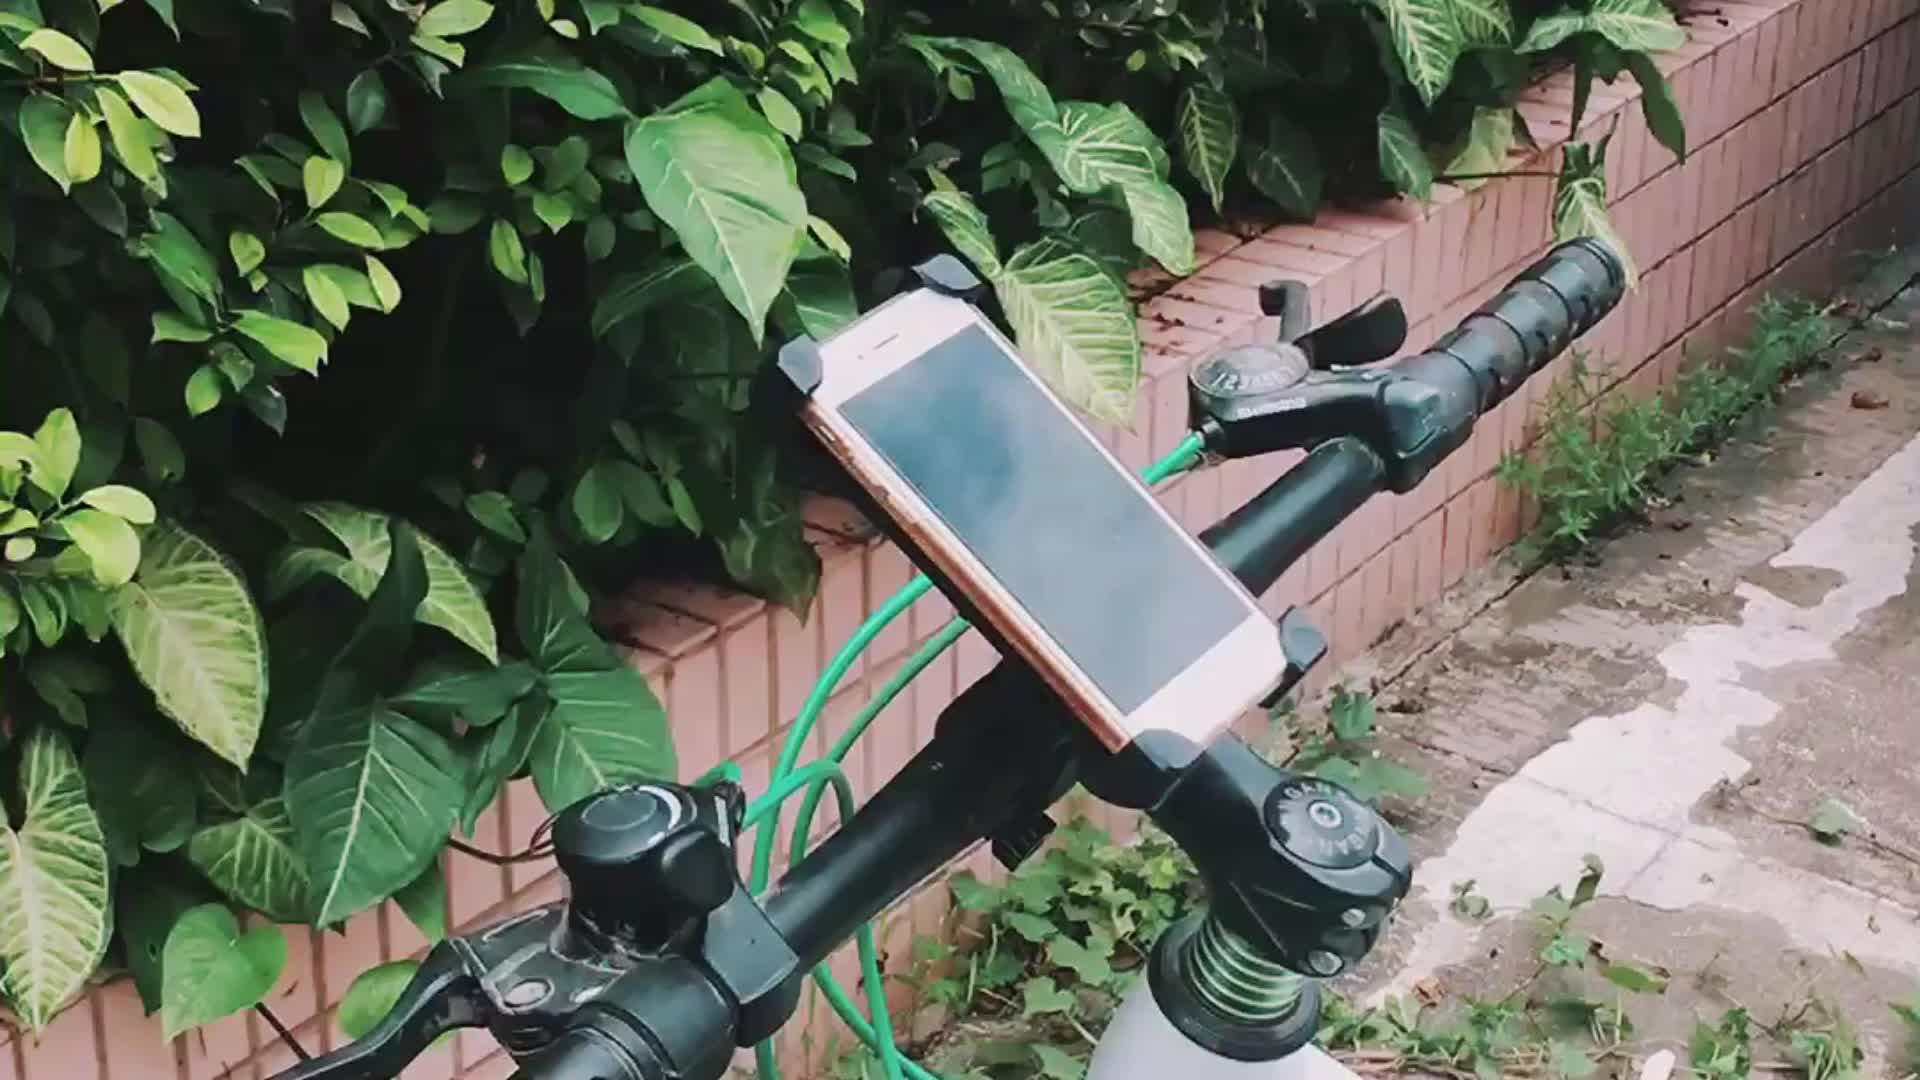 2020 Best Selling Low Price Motorcycle Phone Holder Universal Cell Phone Holder For Motorcycle